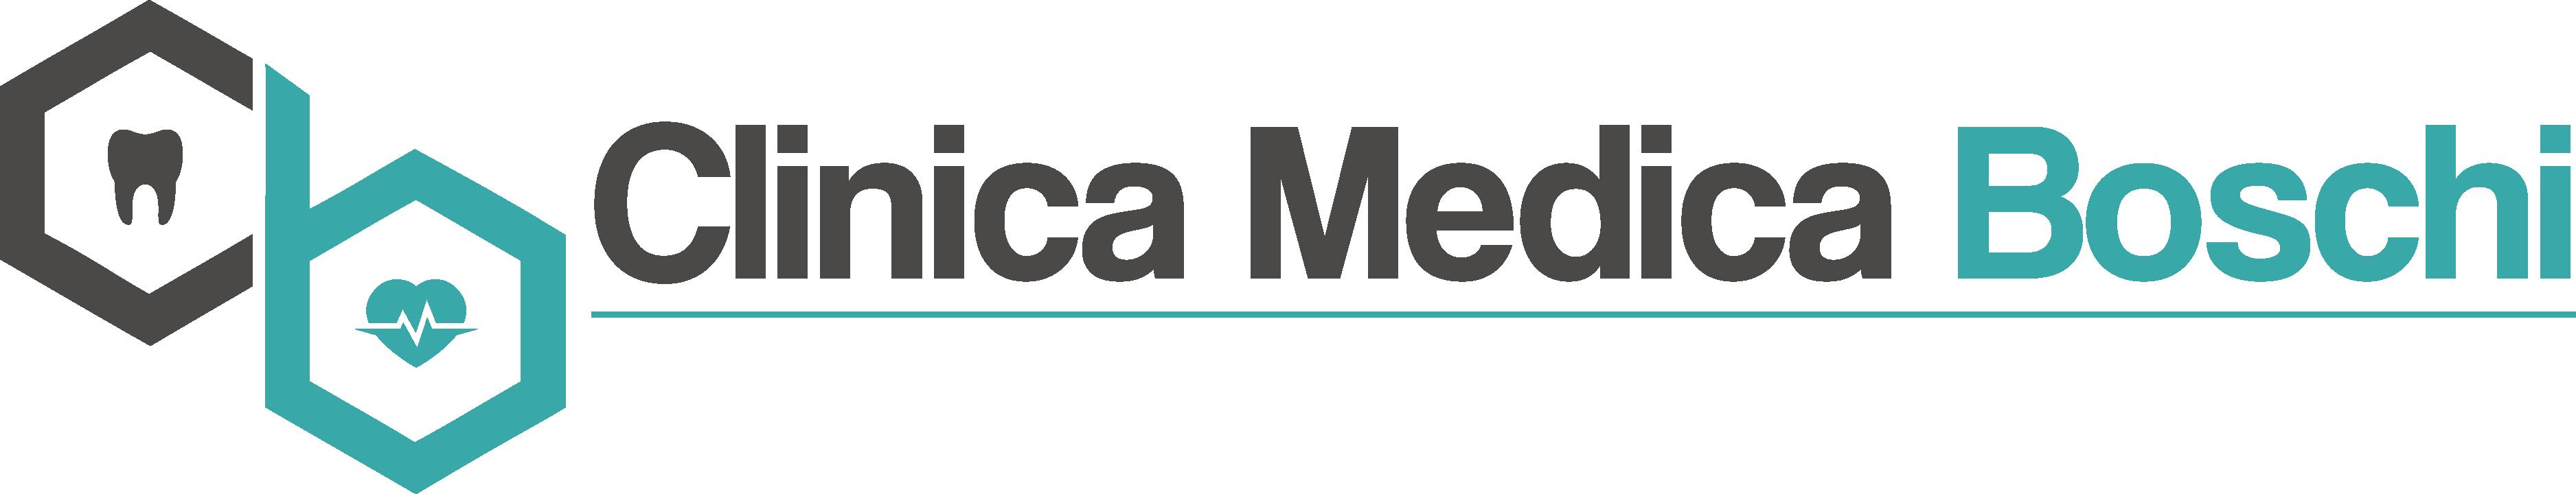 Clinica Medica Boschi